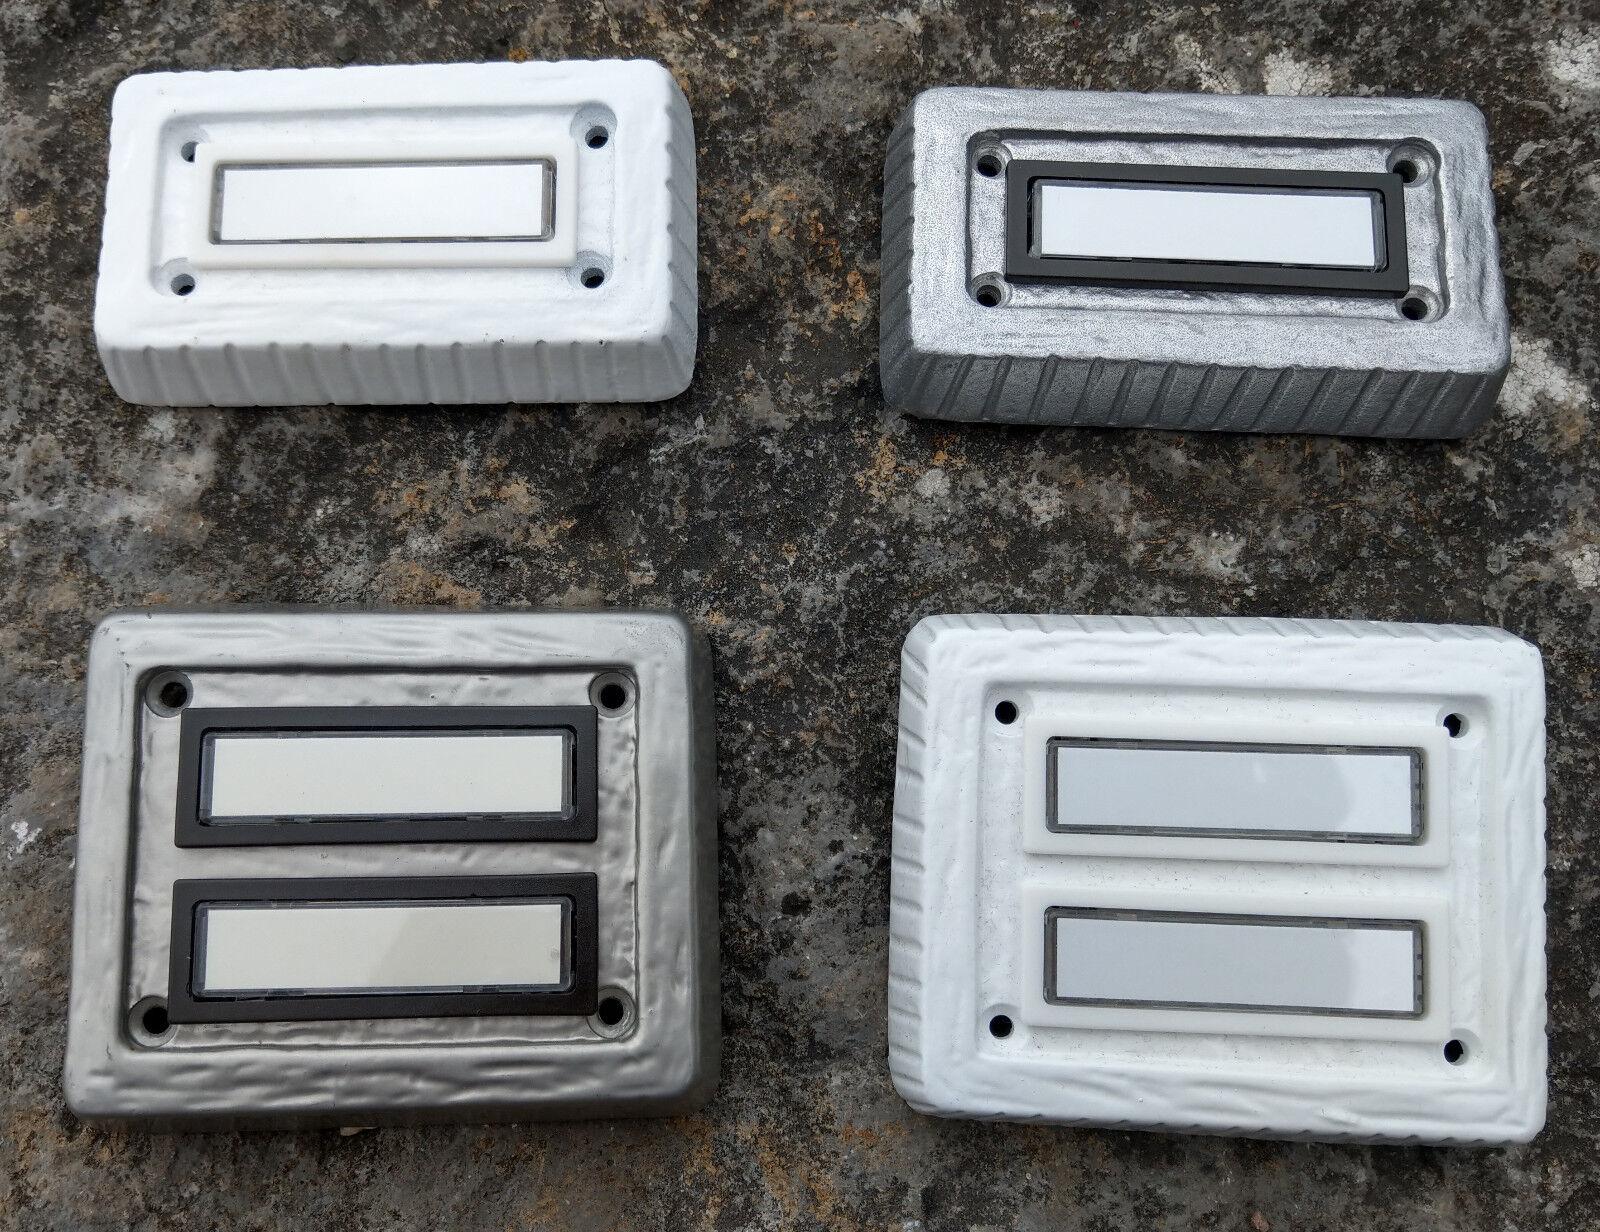 Klingel Klingeltaster Klingelknopf Klingelplatte LM-Metall / titan  - Auswahl